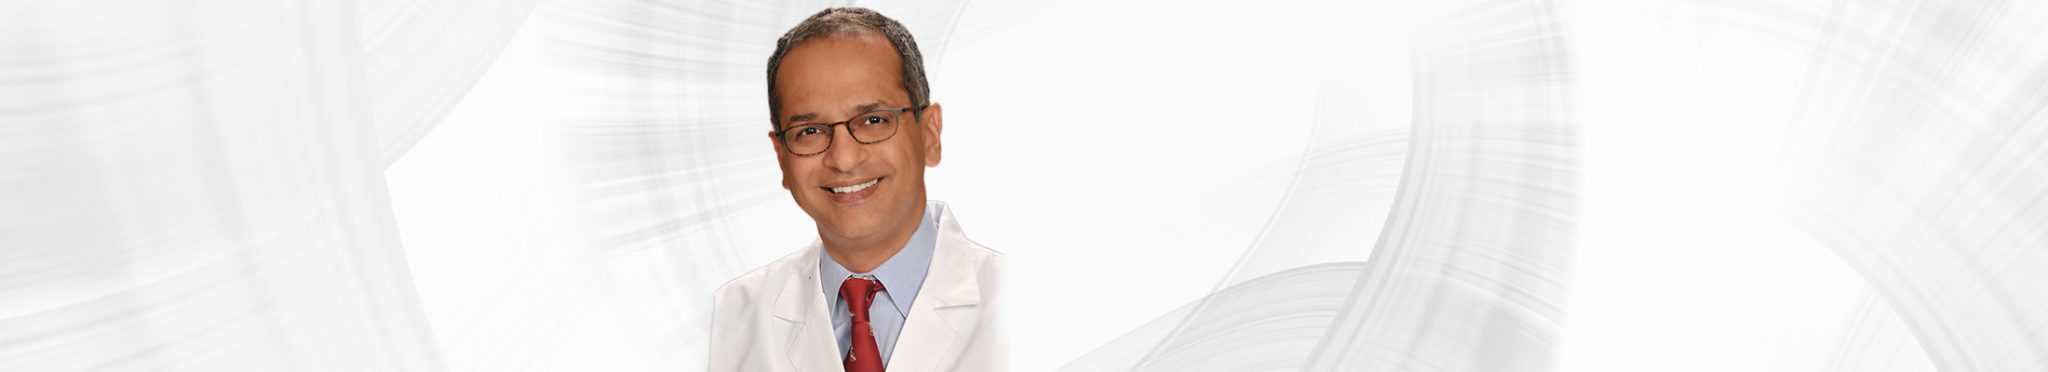 Dr. Zahid S. Lalani - Northwest Oral & Maxillofacial Surgery